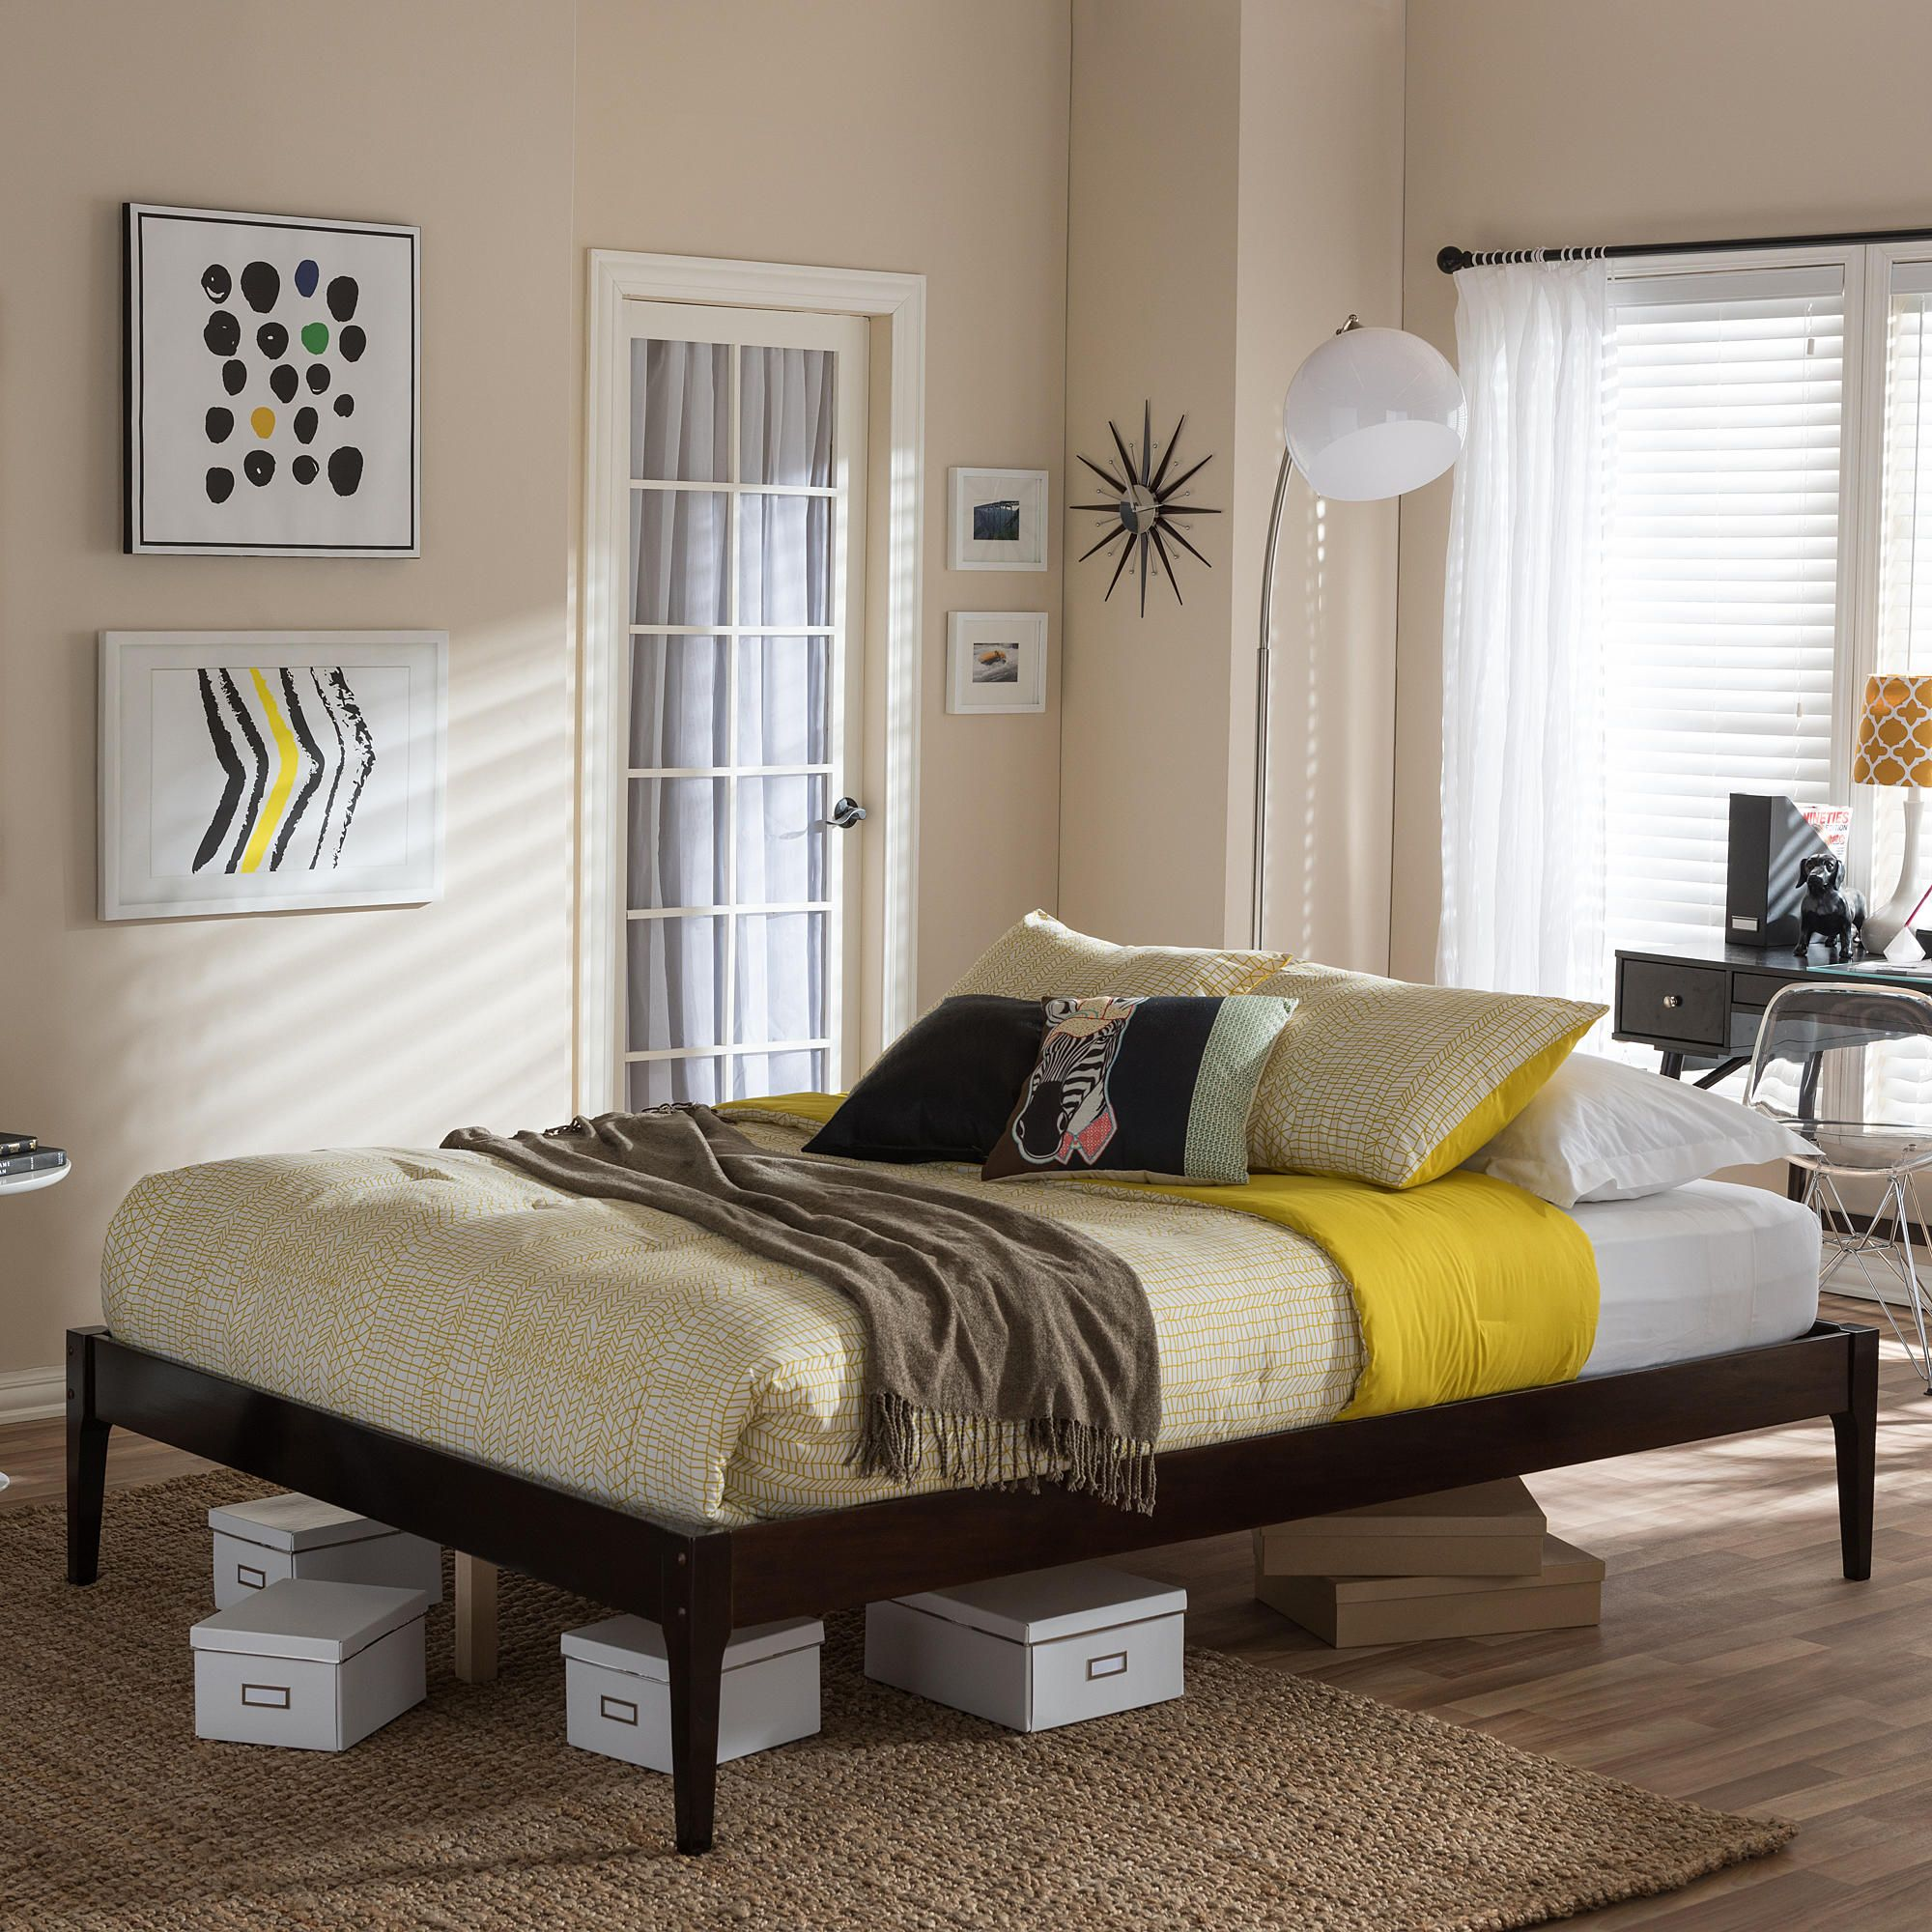 Baxton Studio Bentley Mid Century Bed Frame From Studio Living: Furniture